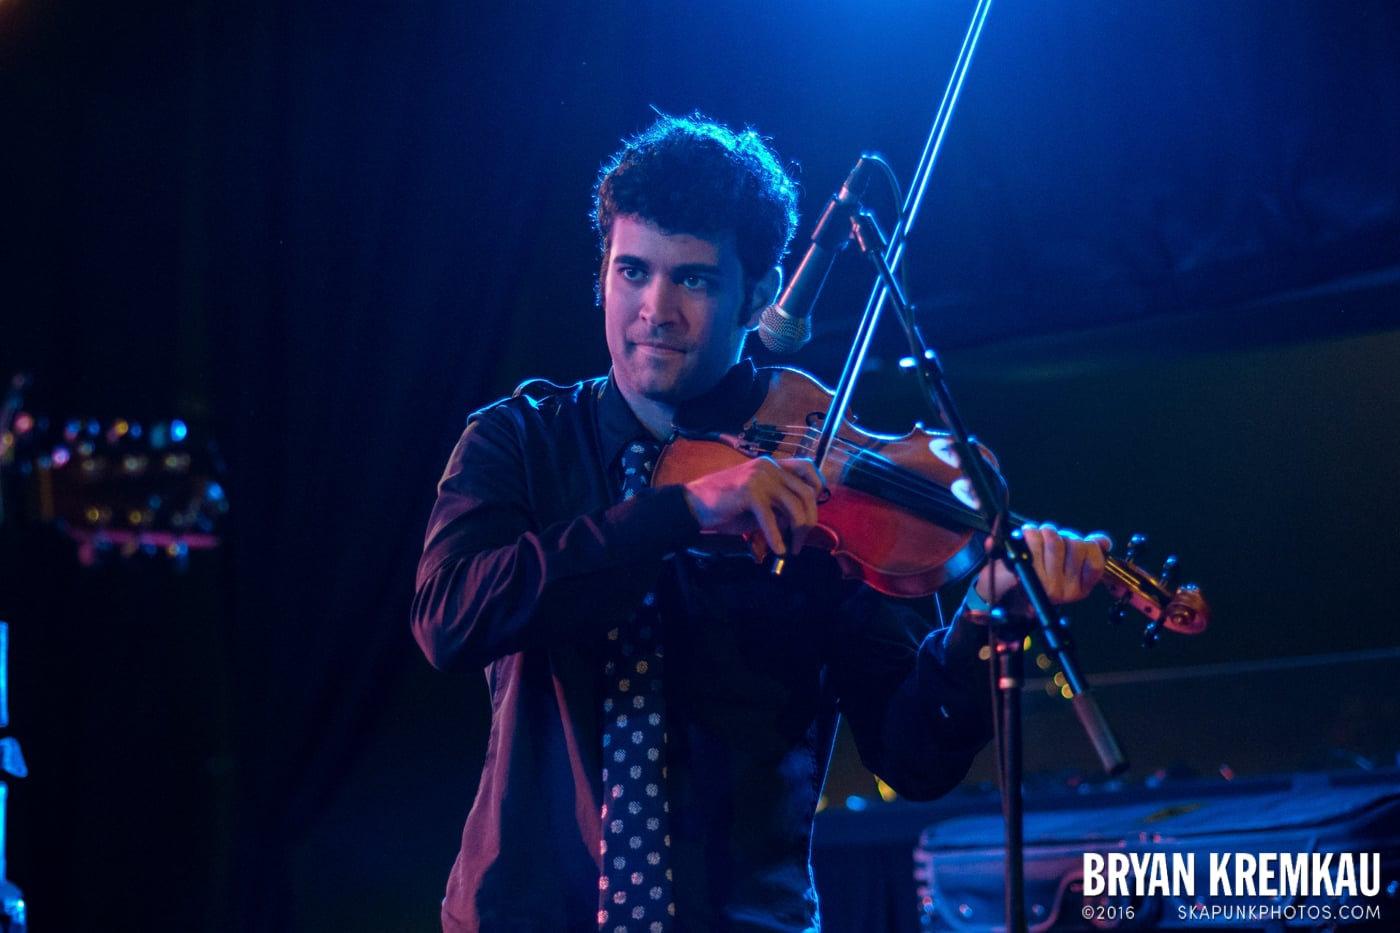 Danny Burns Band @ Knitting Factory, Brooklyn, NY - 9.10.14 (8)